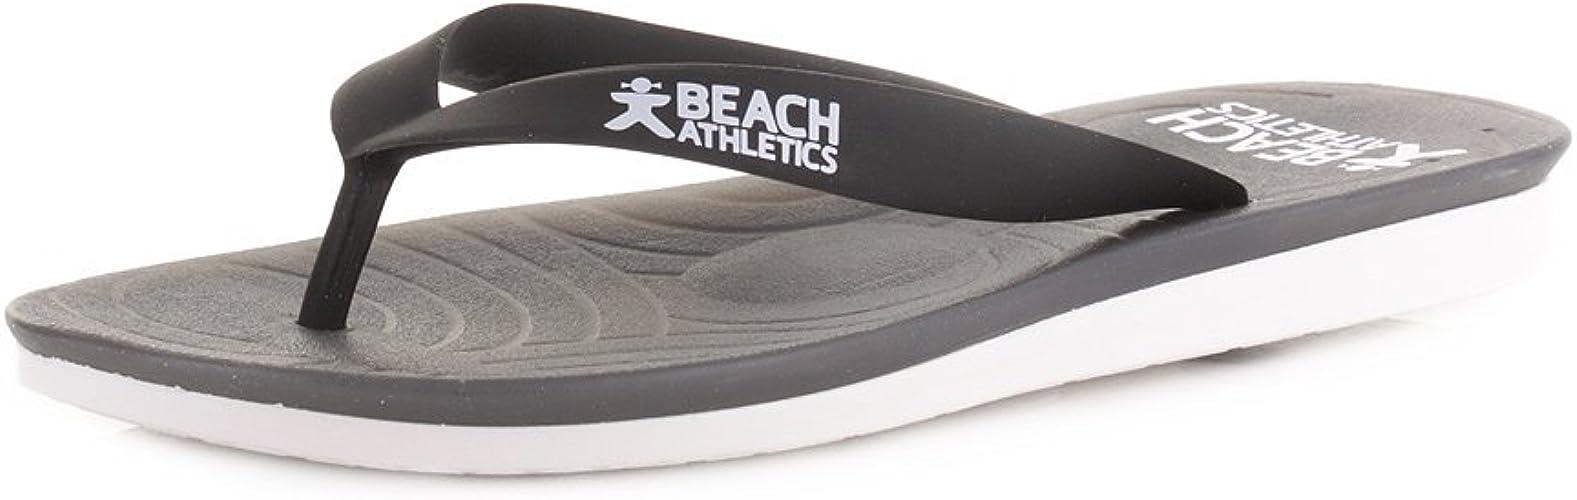 St Tropez Black Flip Flops SIZE